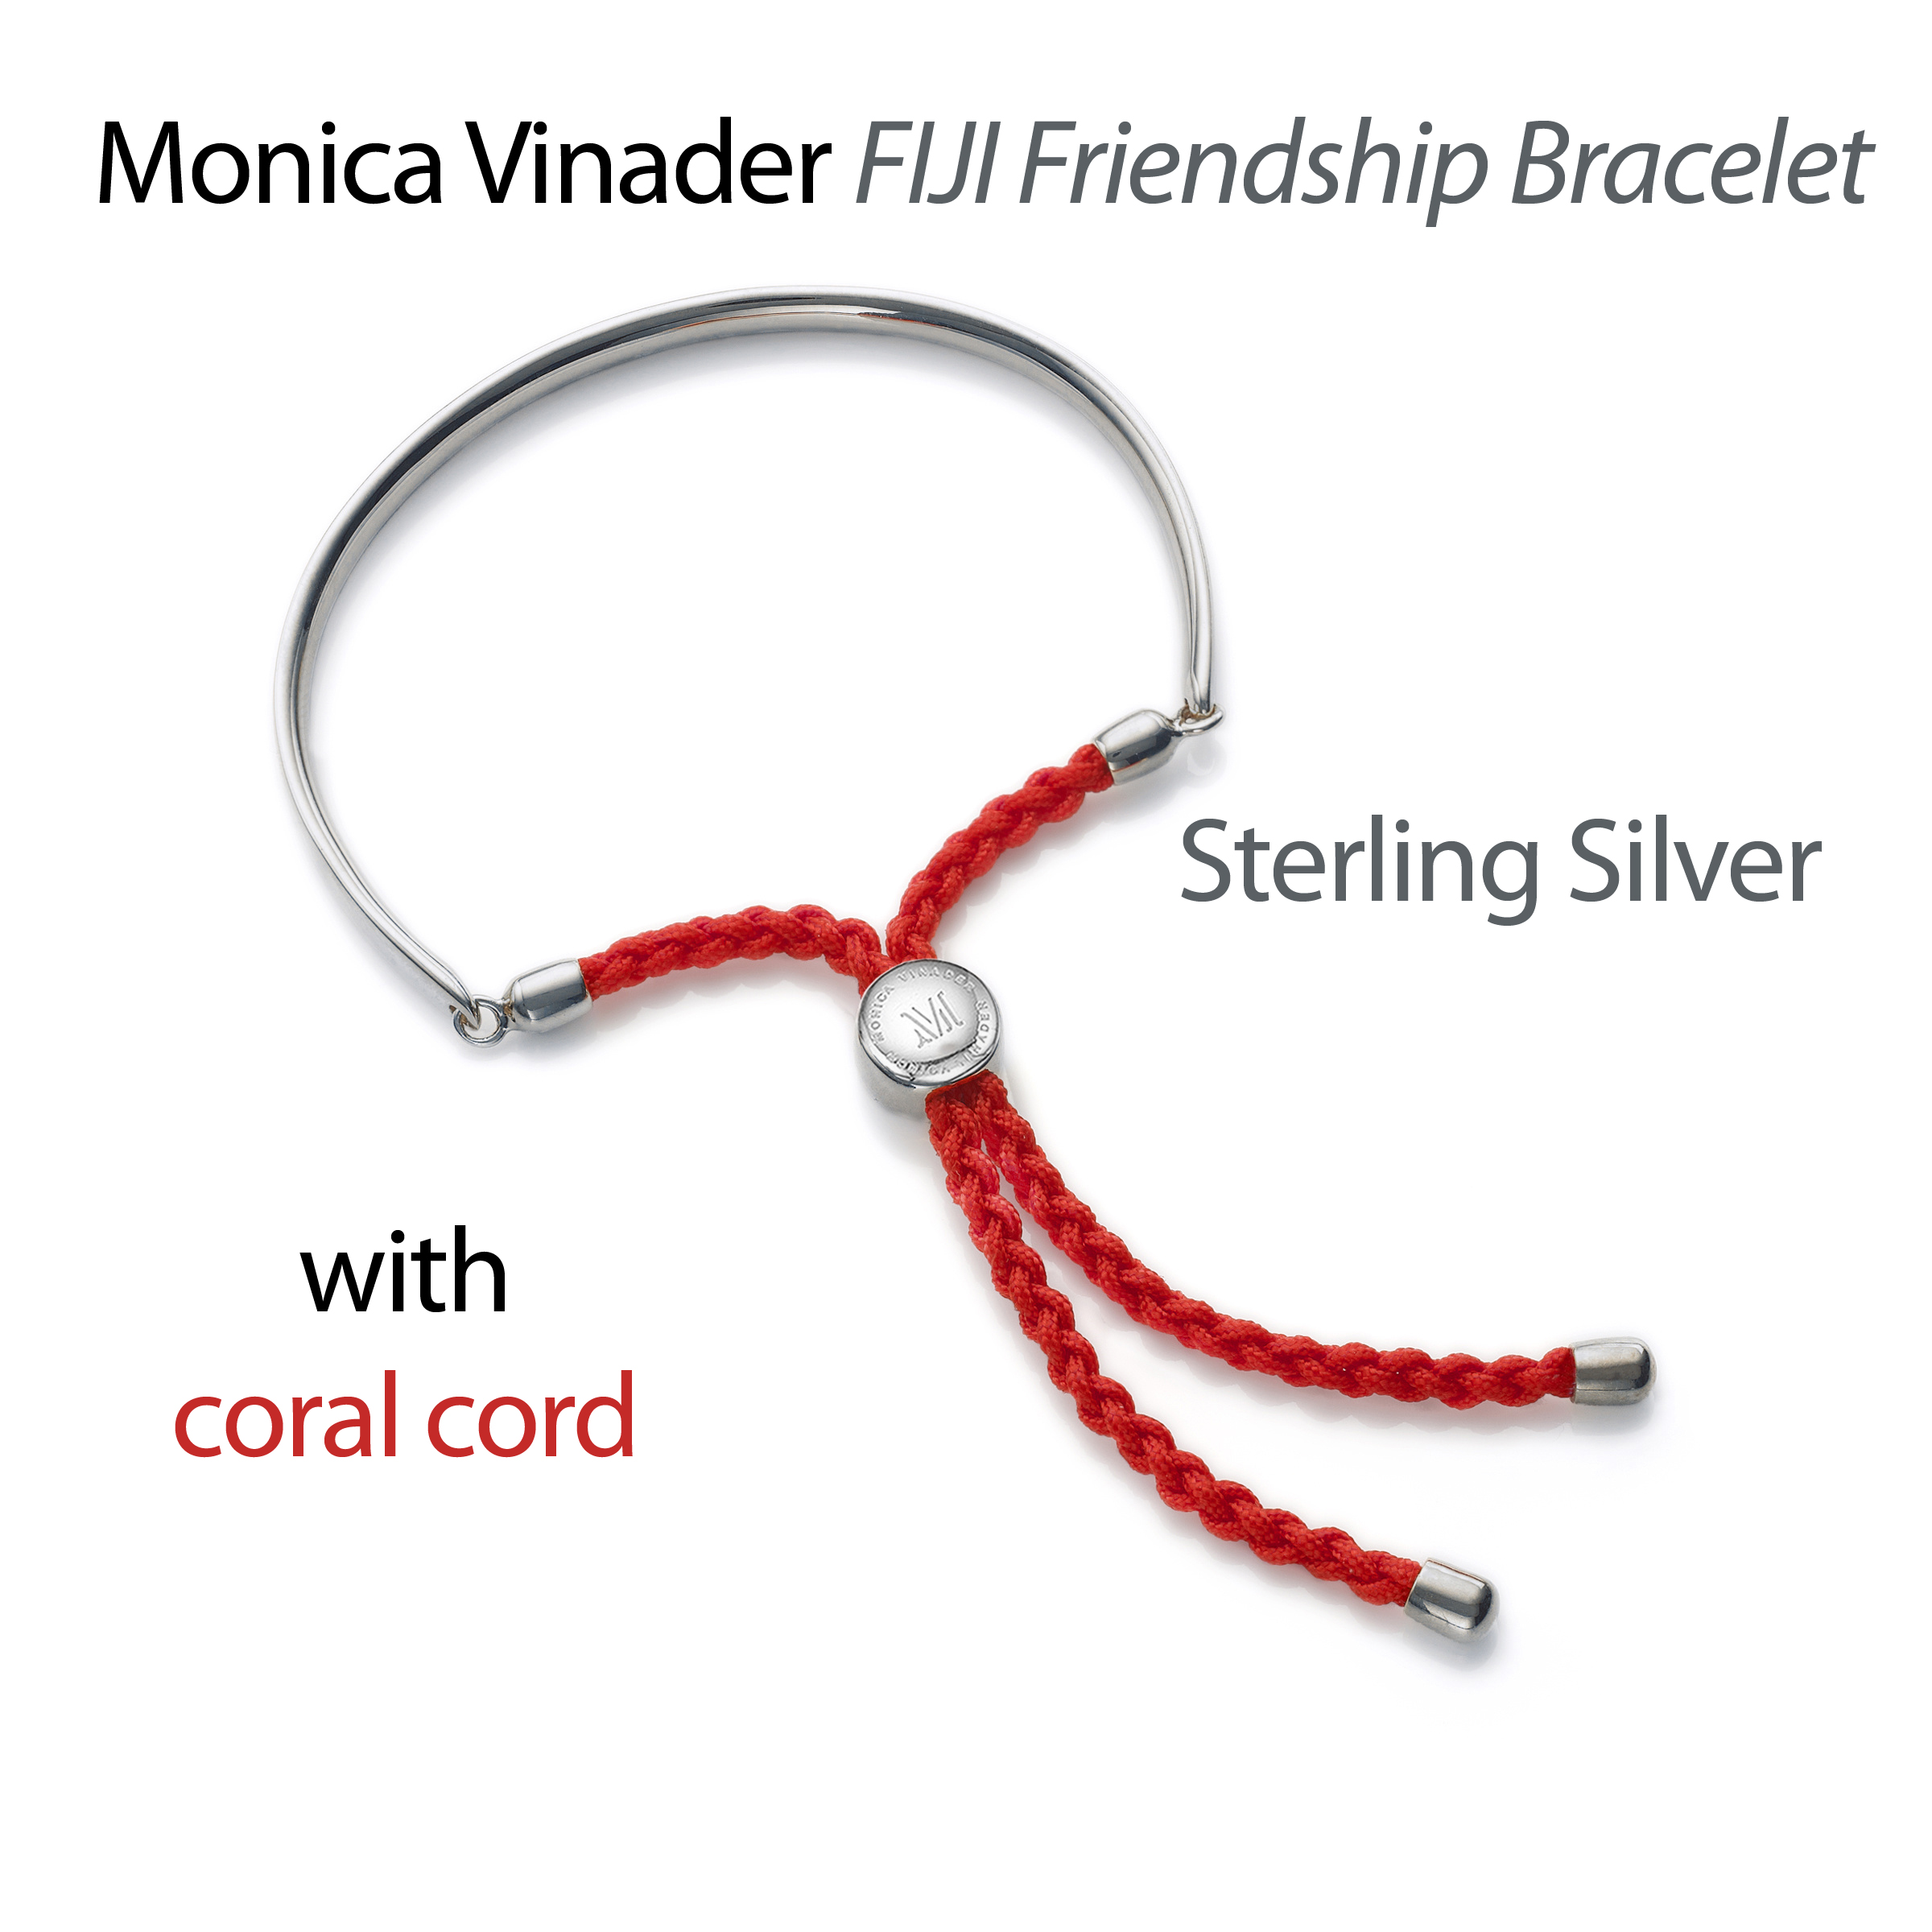 Monica Vinader Fiji friendship bracelet sterling silver with coral cord